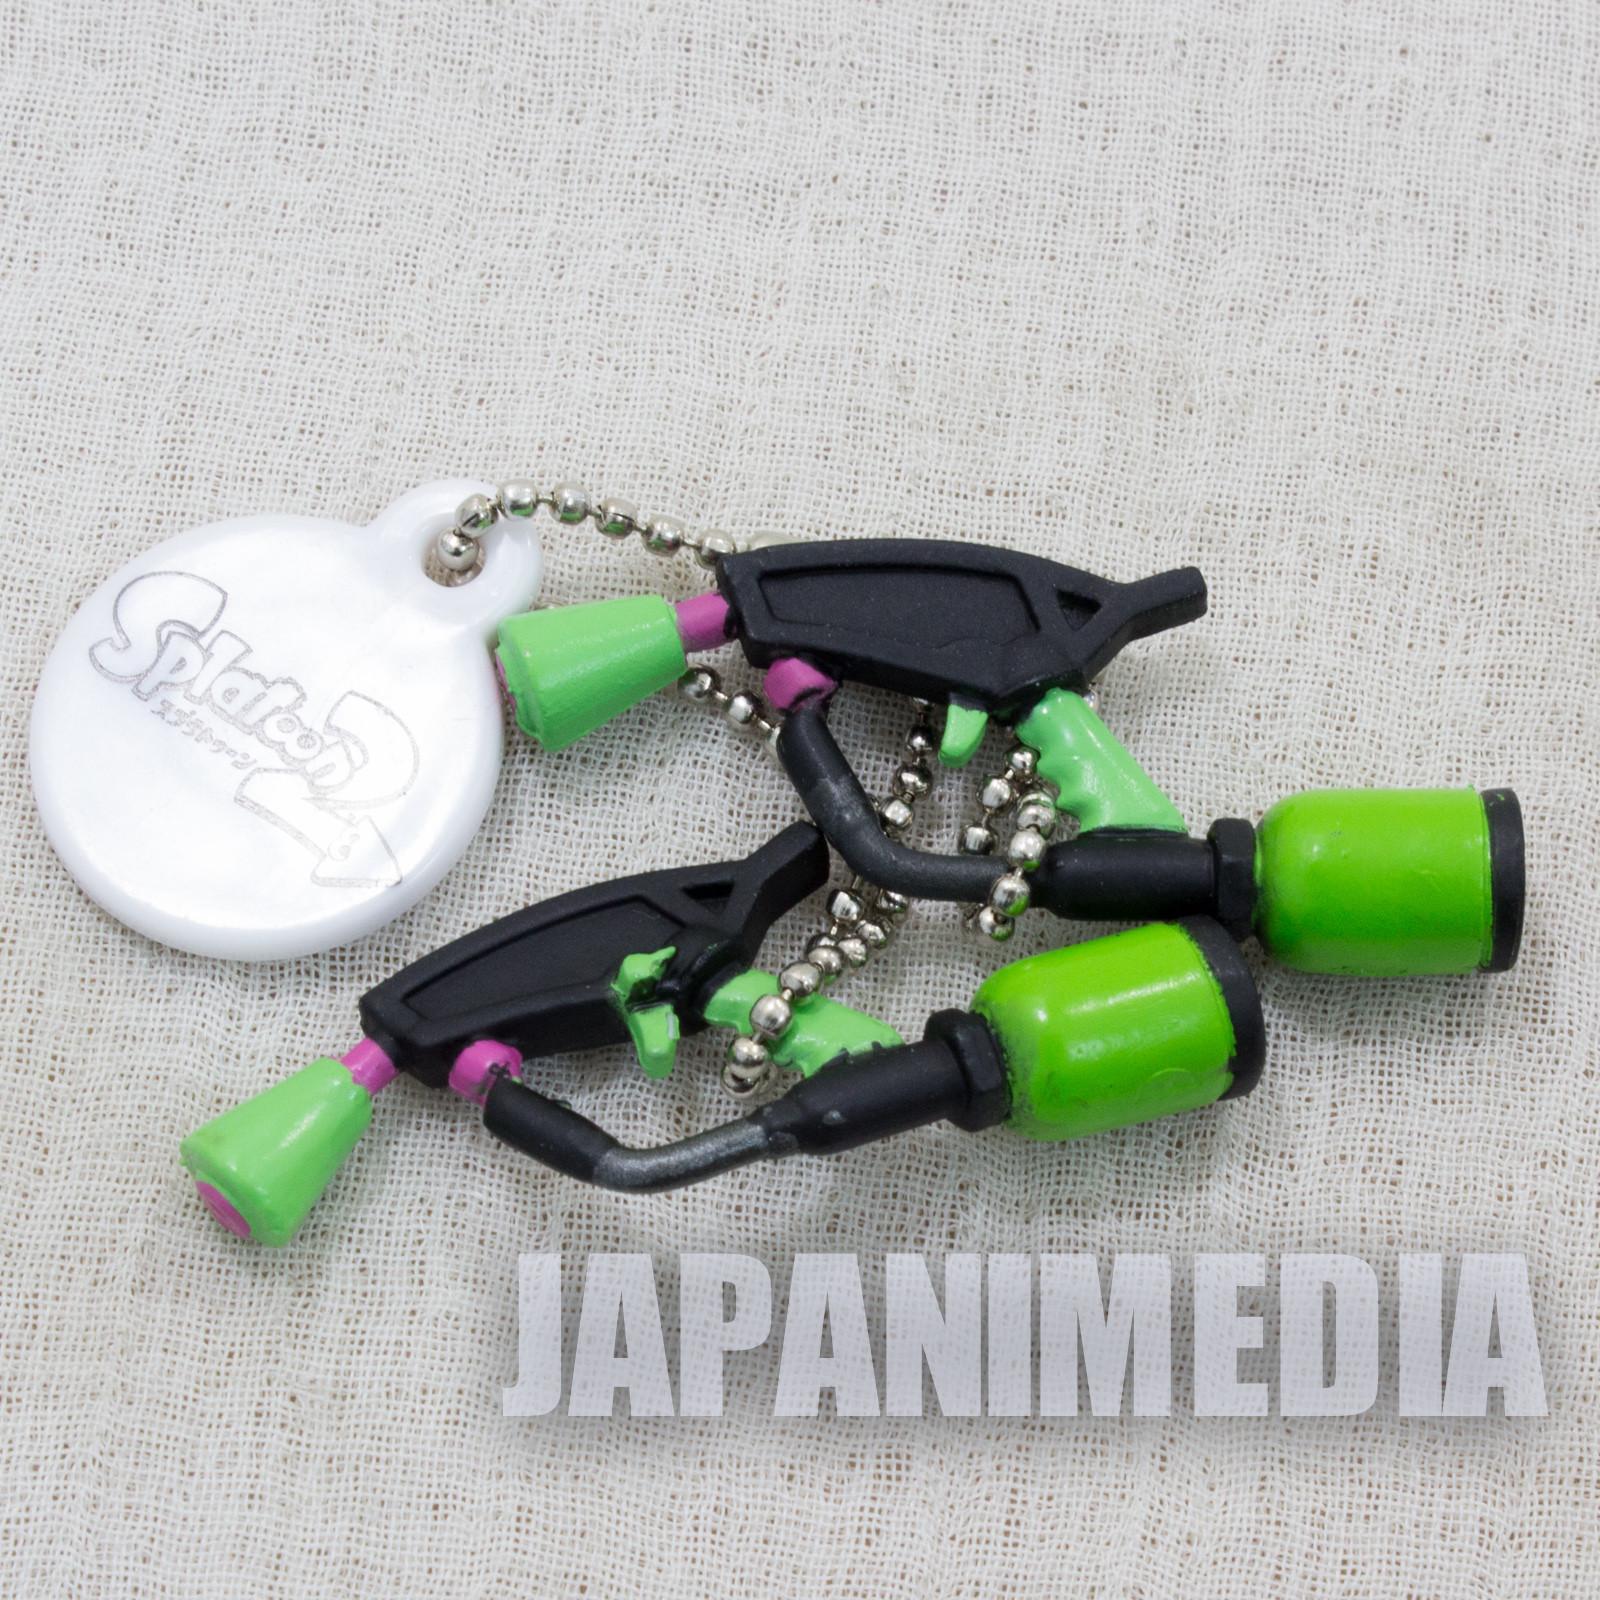 Splatoon 2 Weapon Figure Ballchain Splat Dualies #3 Takara Tomy Nintendo Switch